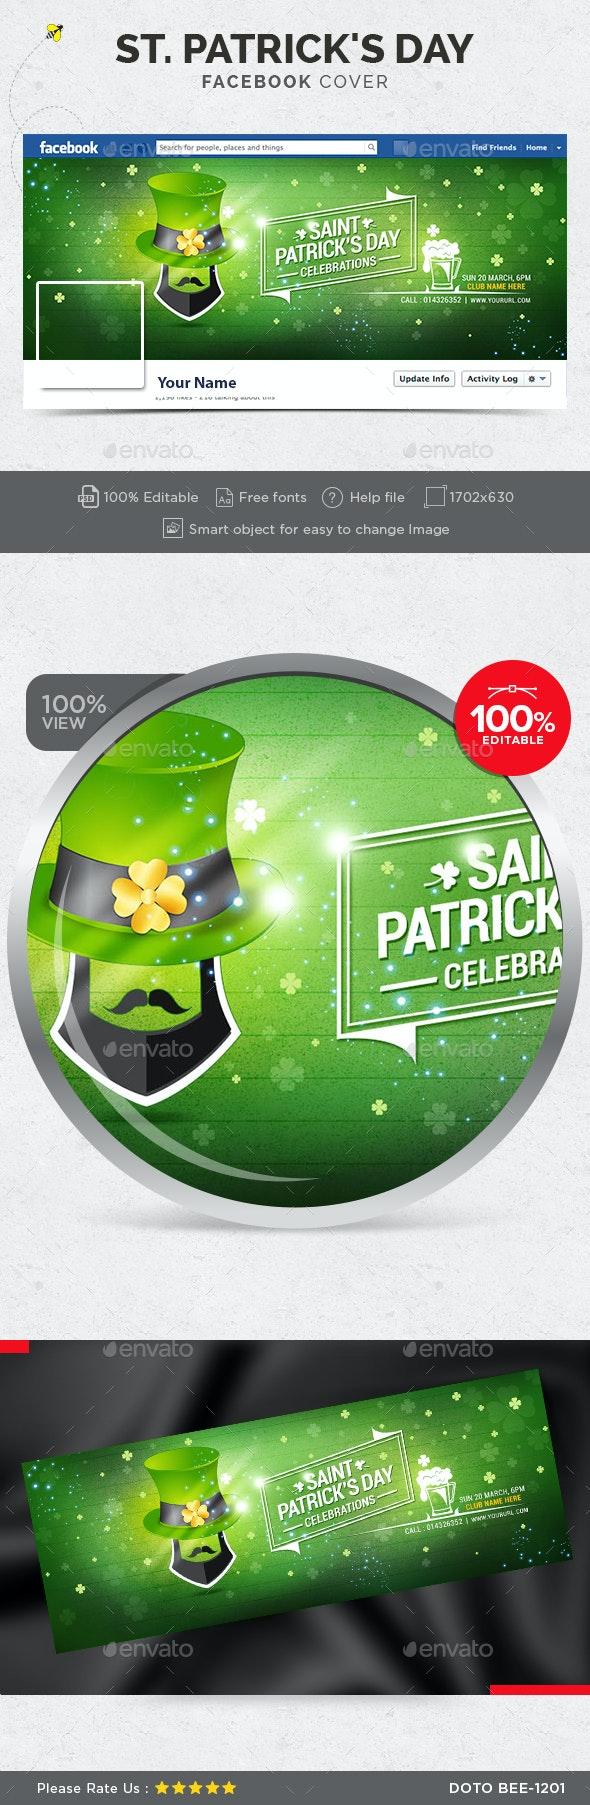 St. Patrick's Day Facebook Cover - Facebook Timeline Covers Social Media